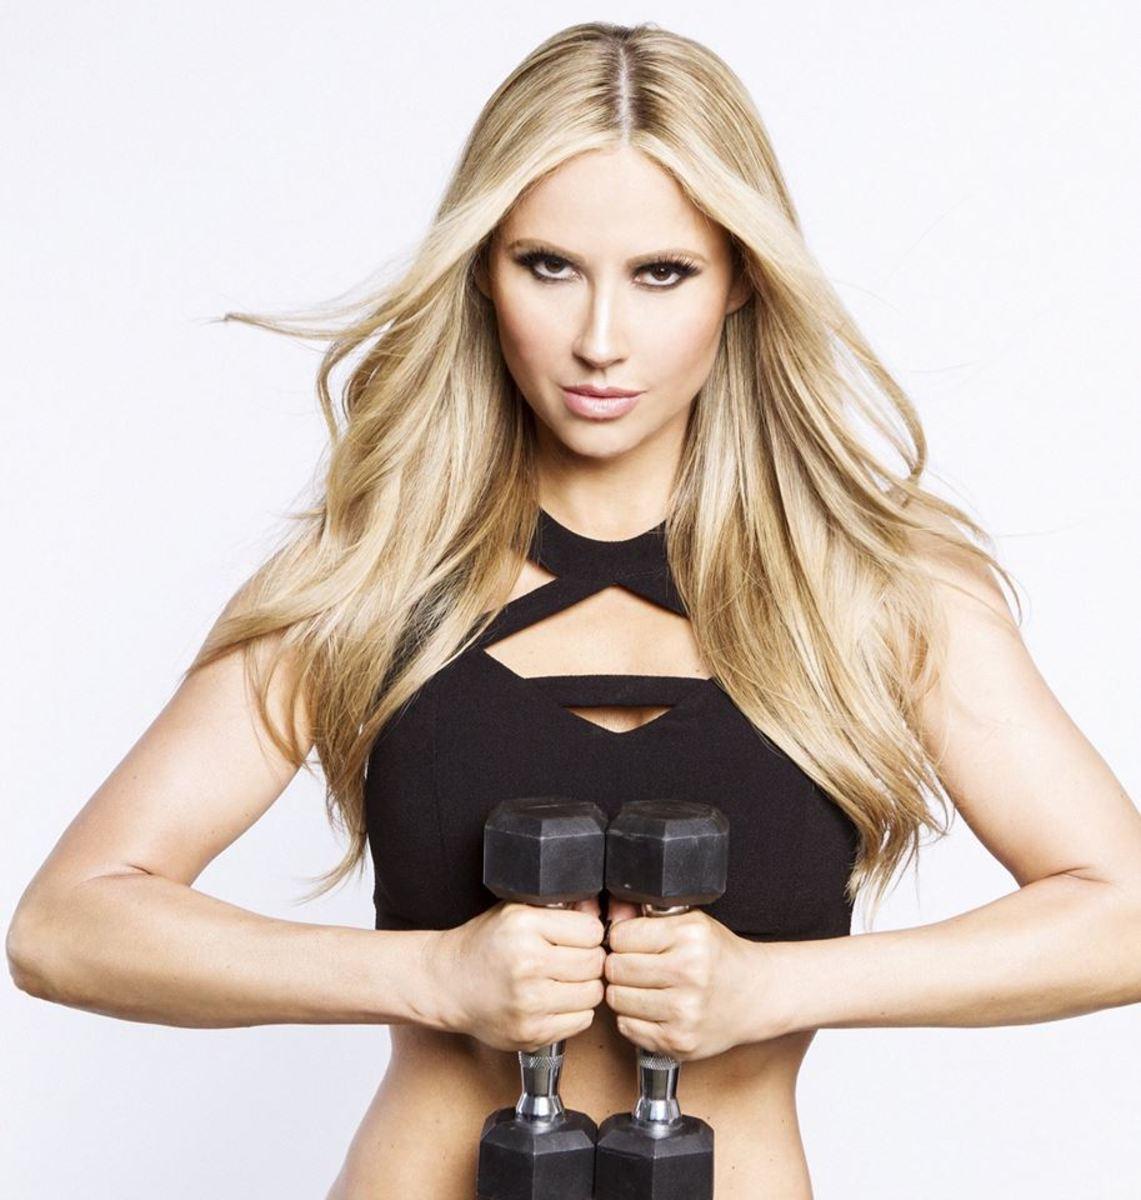 Marzia Prince - Female Fitness Model